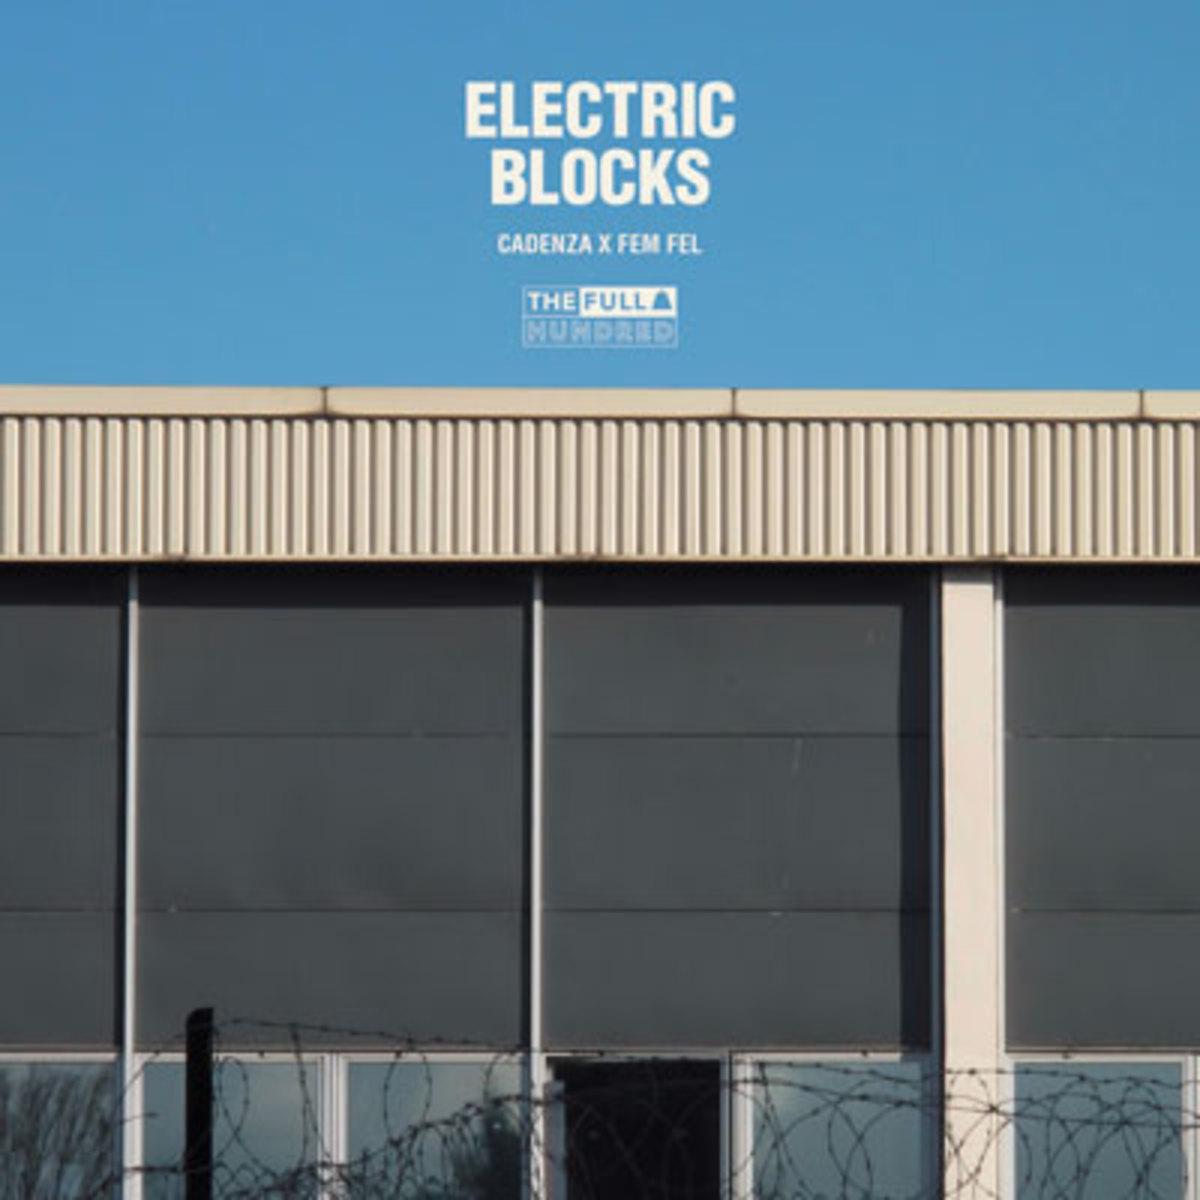 cadenza-electricblocks.jpg